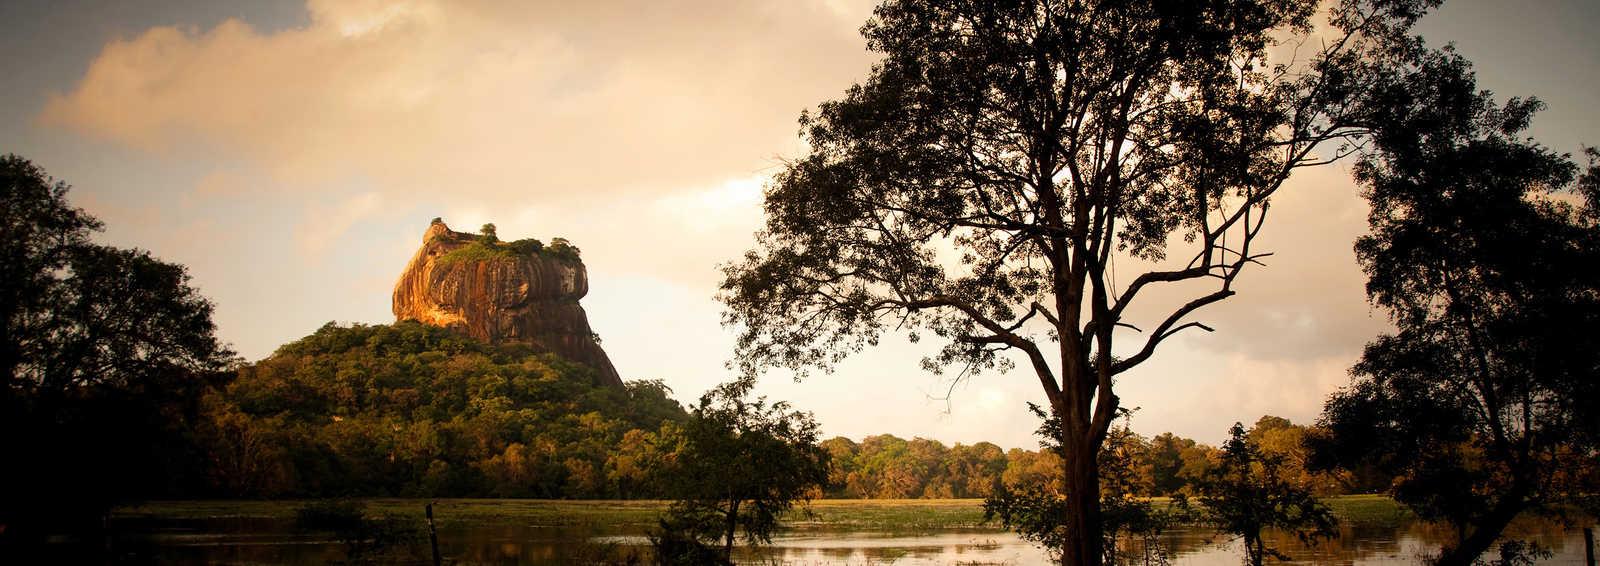 Sigiriya Lion Rock Fortress, Sri Lanka